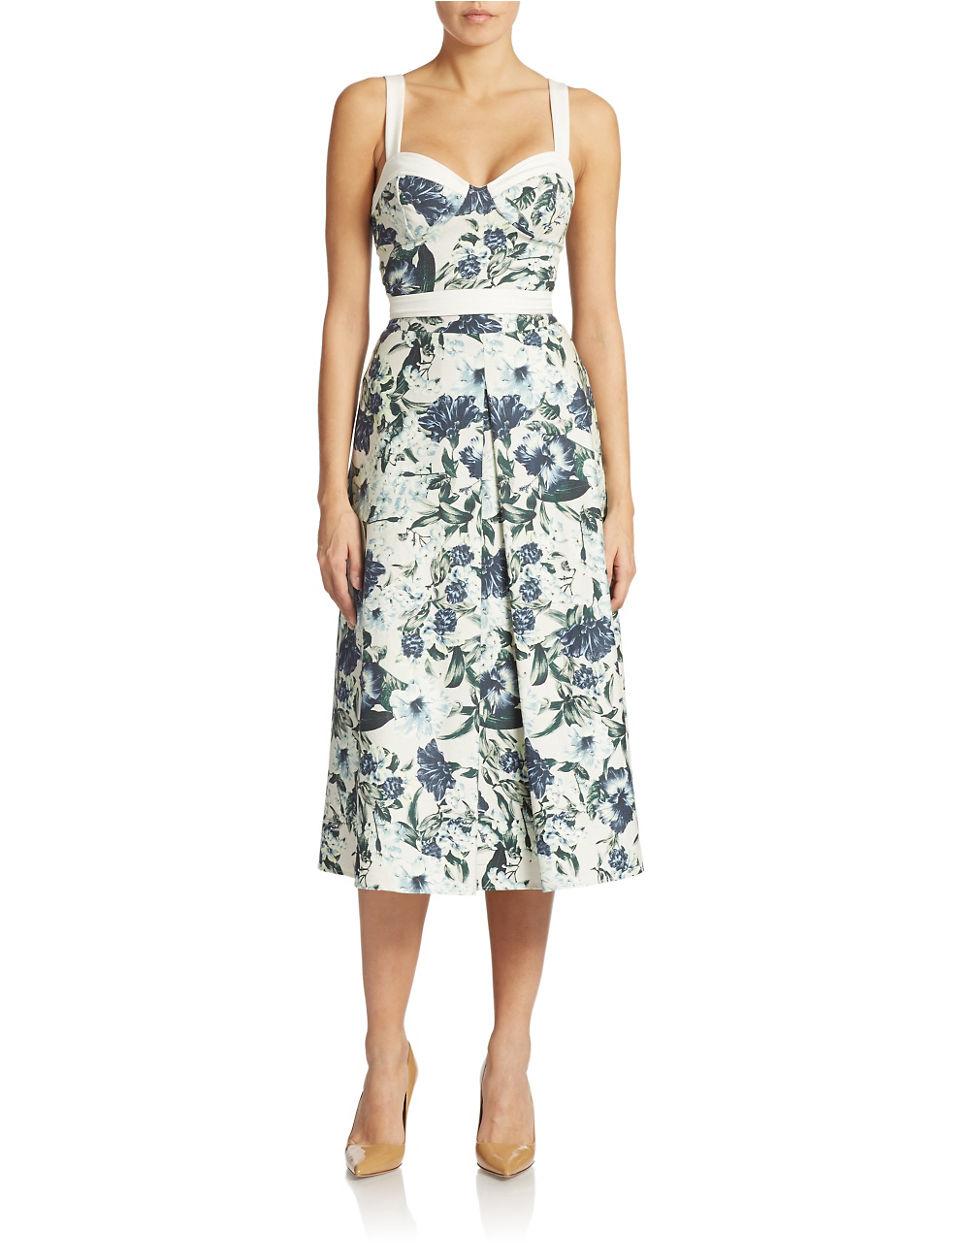 Abs by allen schwartz Floral Print Tea Length Skirt in Green  Lyst